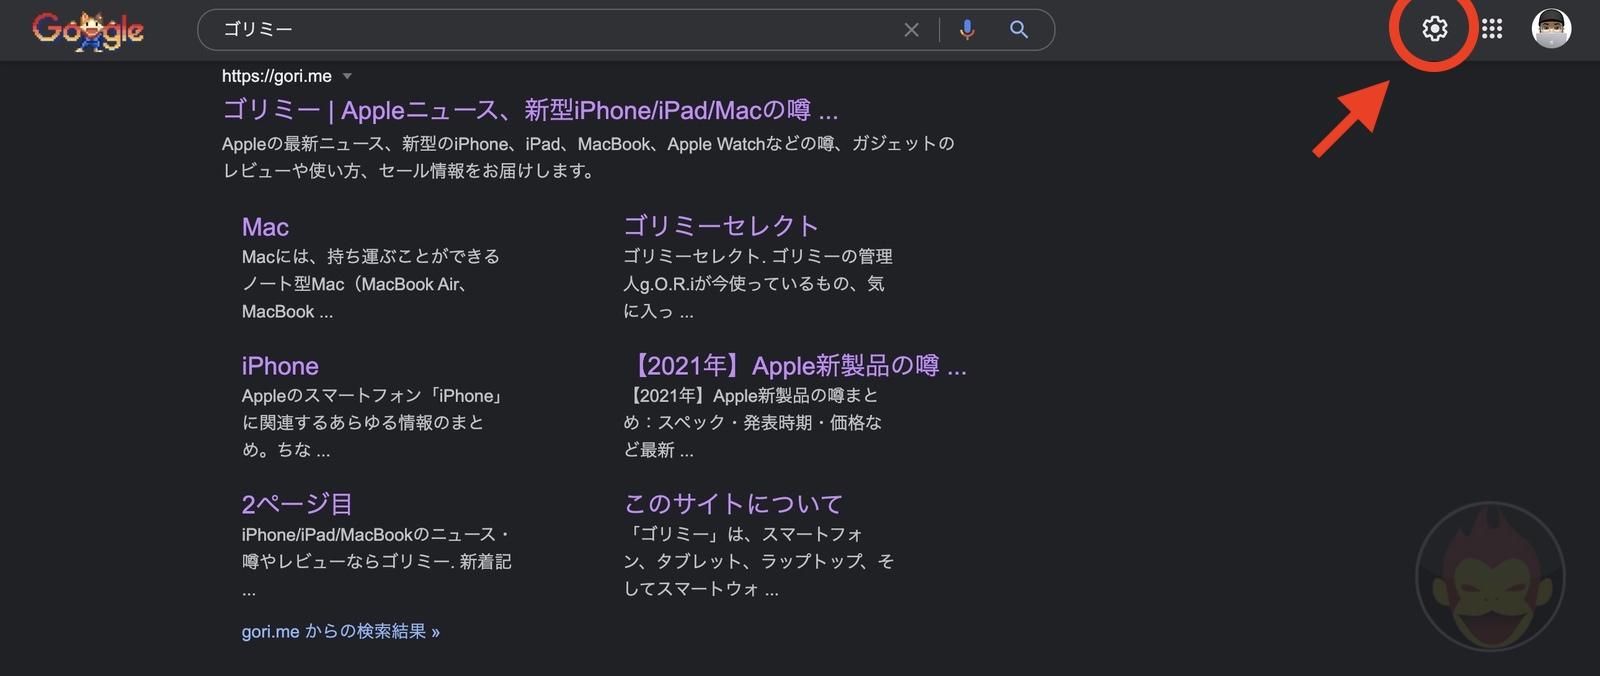 How to fix dark mode on google chrome 03